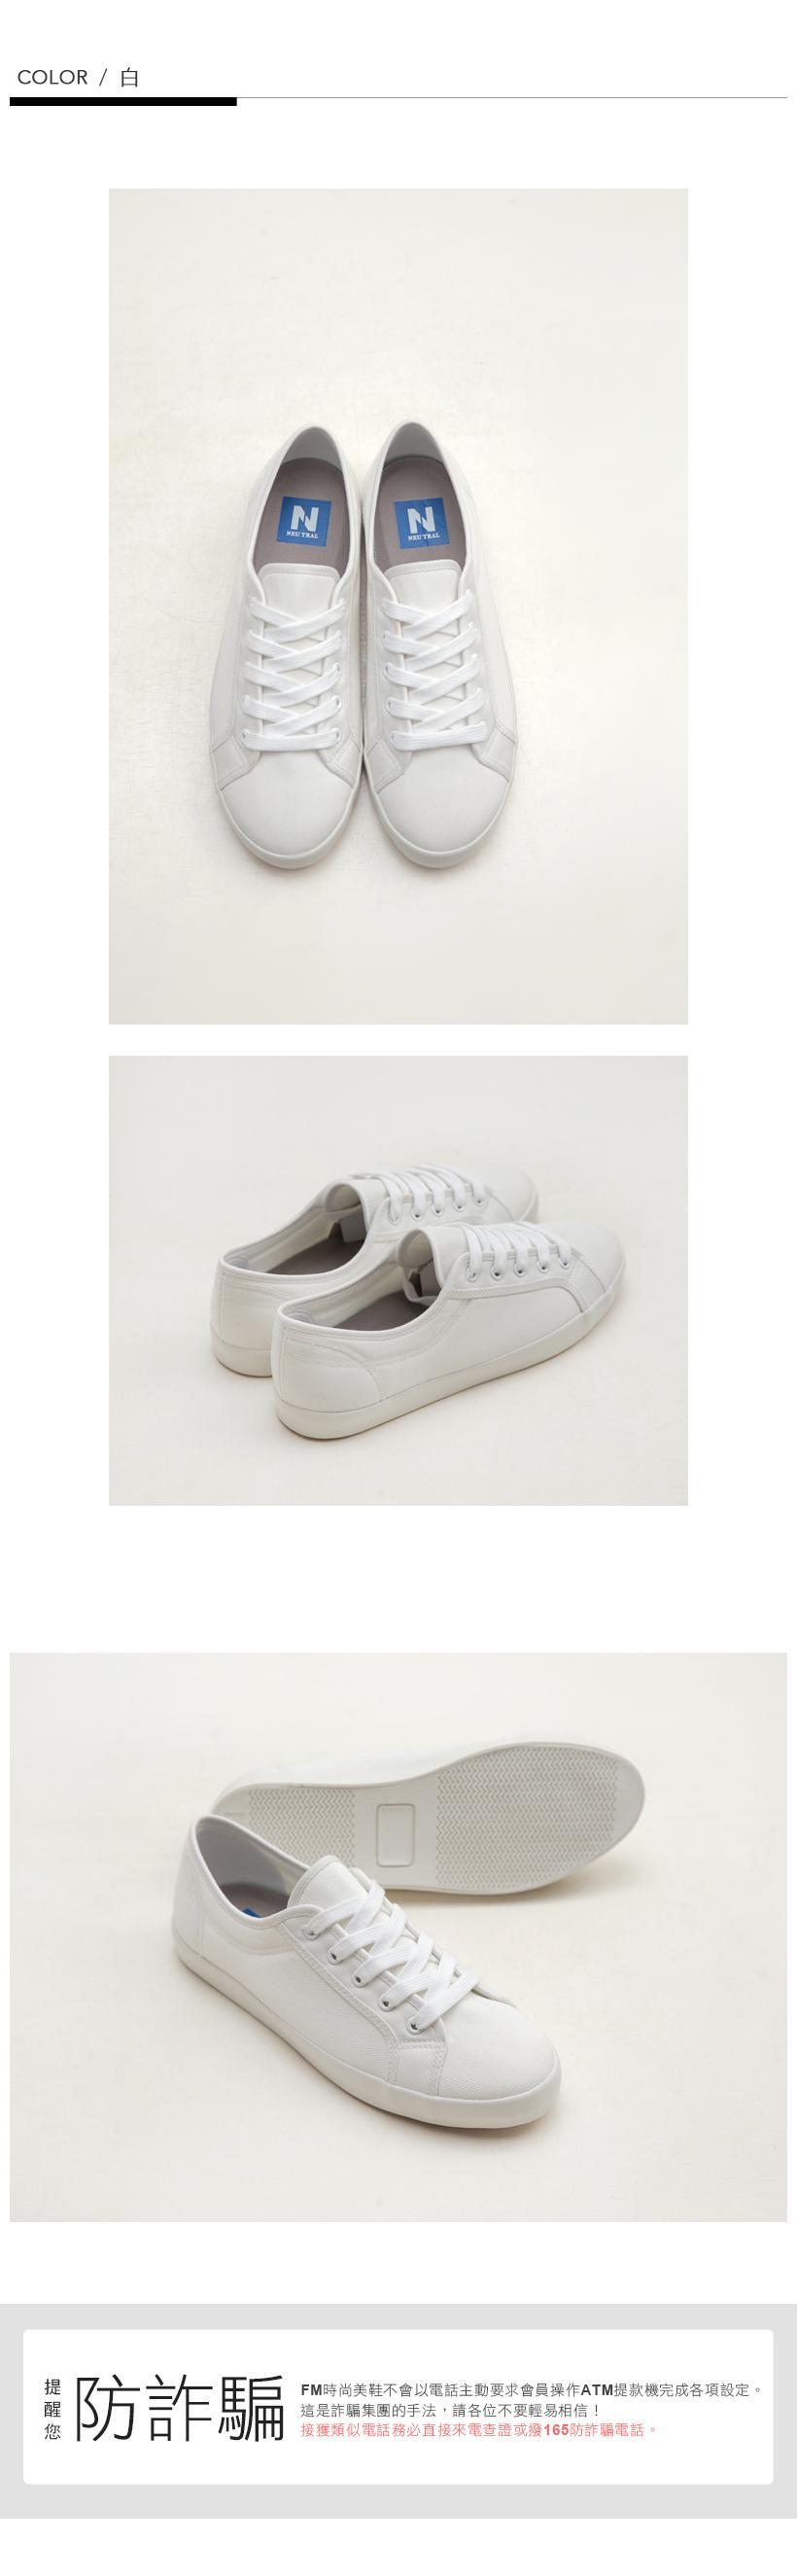 NeuTral-防潑水棉質小白鞋(白)-大尺碼